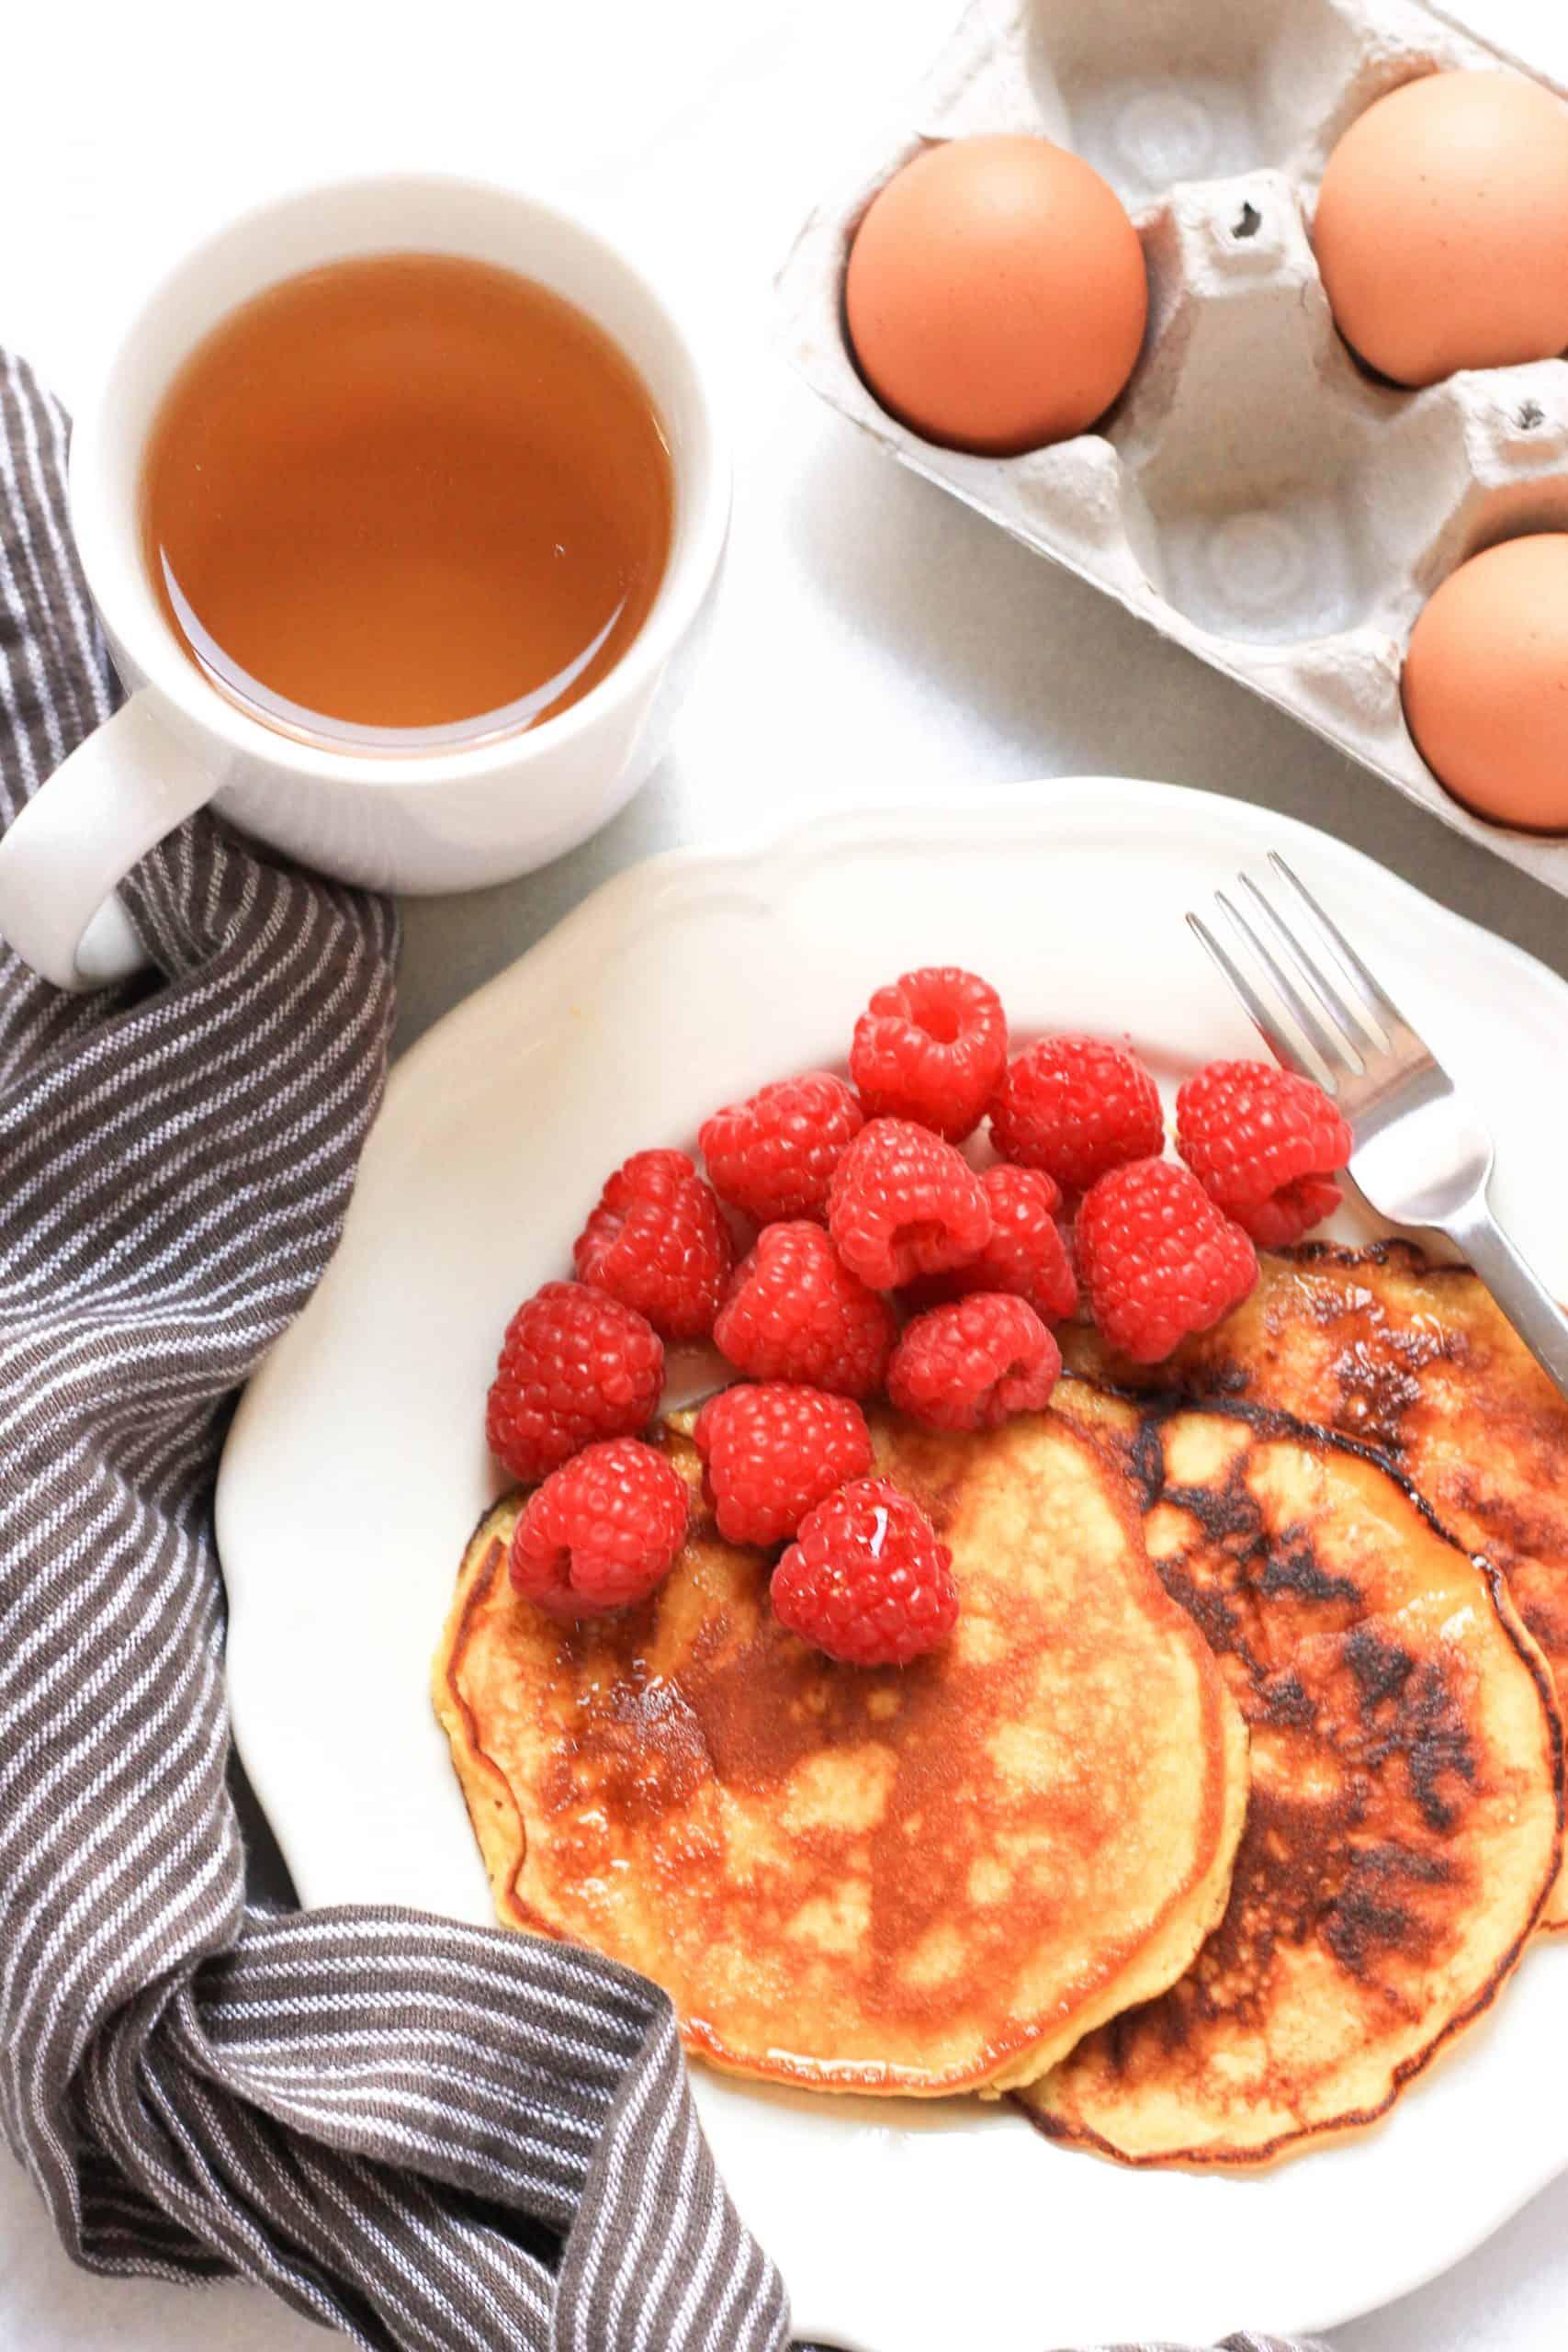 Top down shot of pancakes and raspberries.